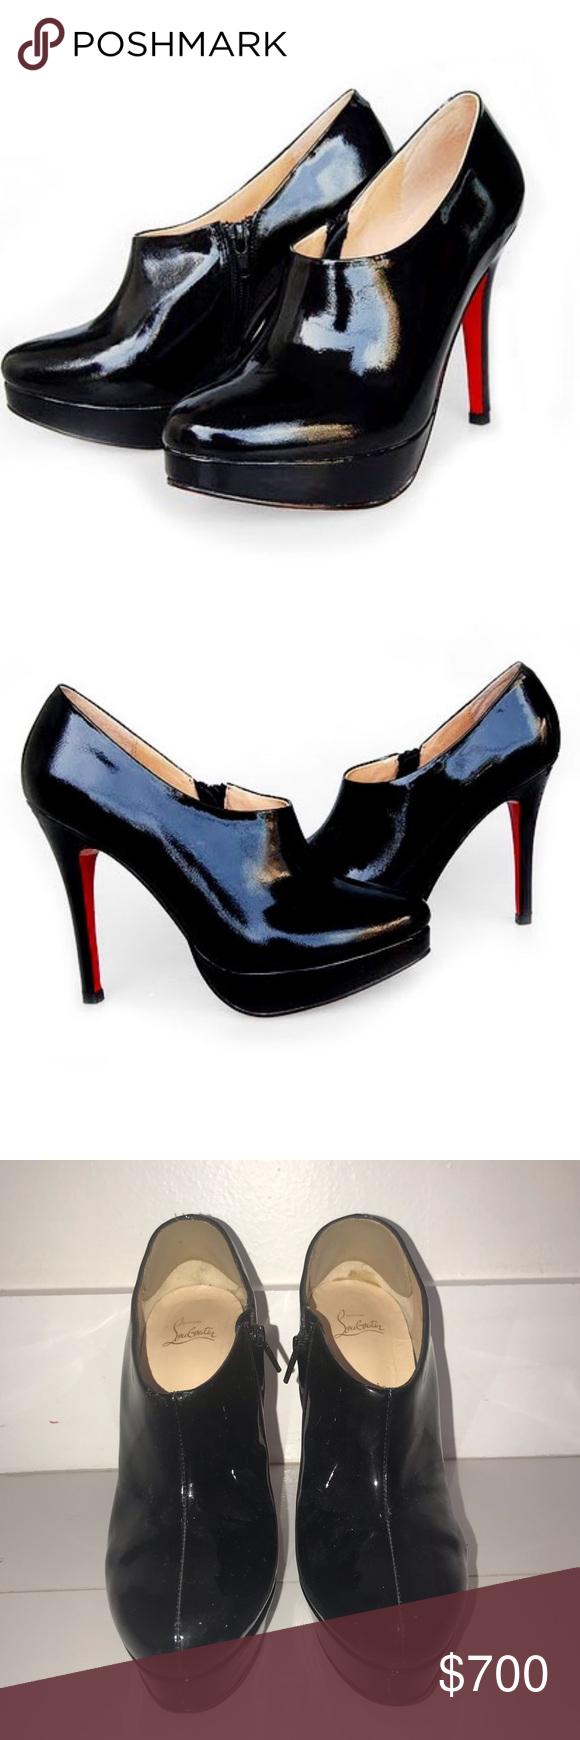 bb01b180643 Louboutins Black Ankle Boots